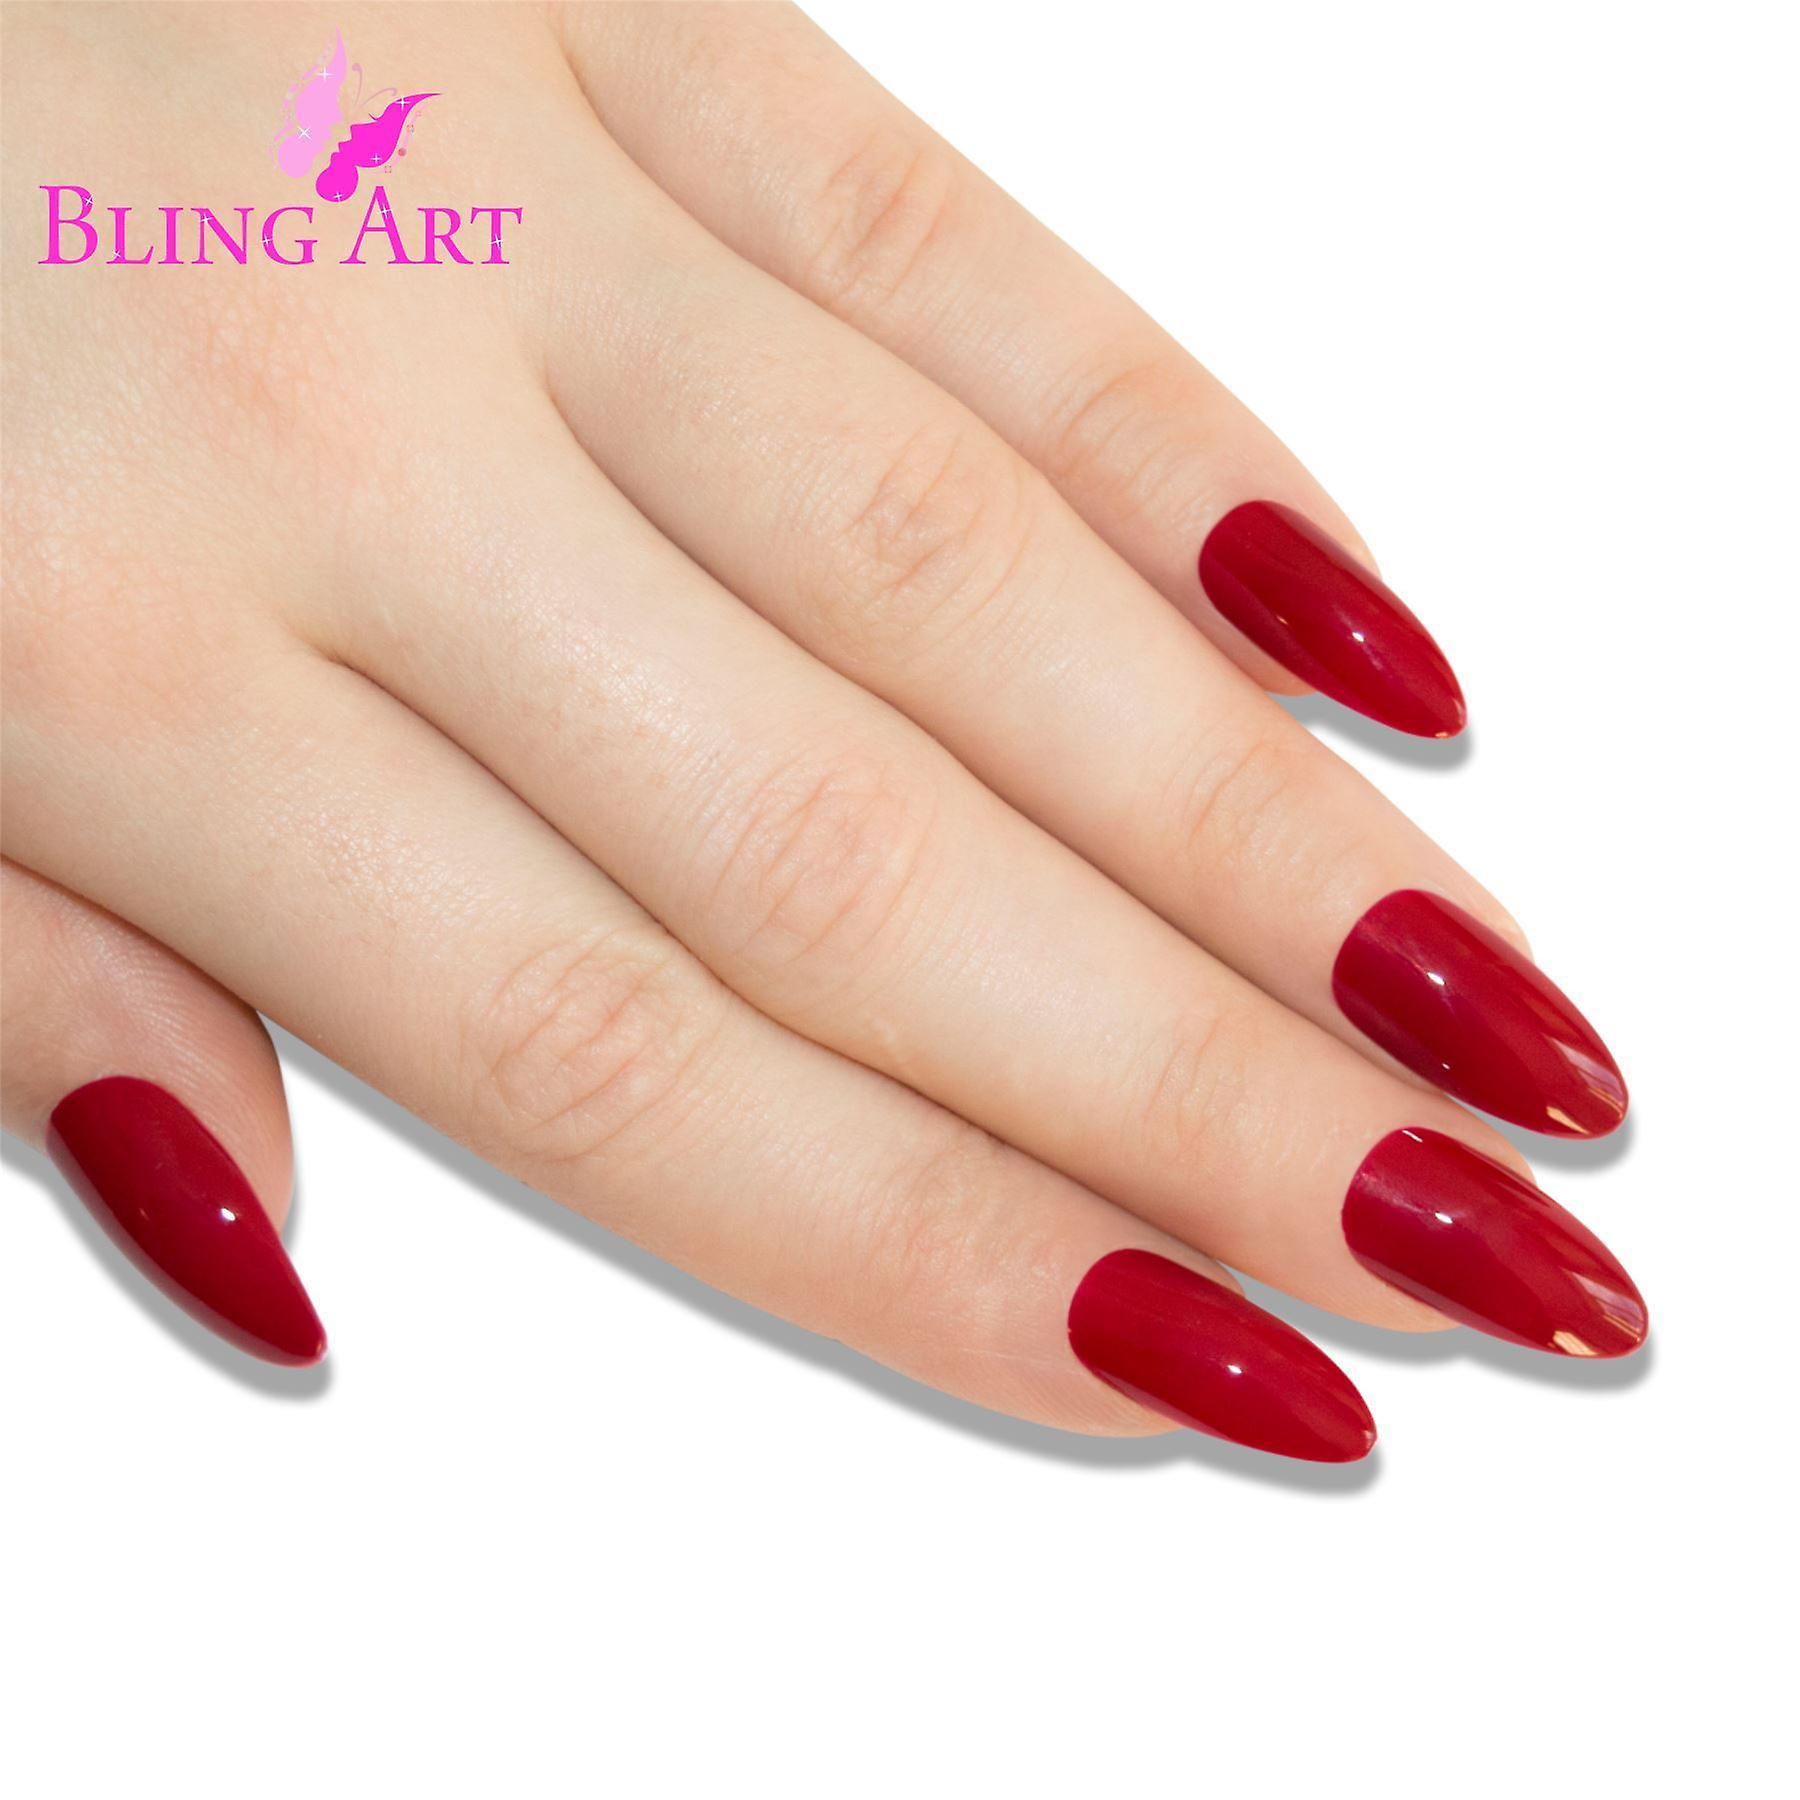 False nails bling art red polished almond stiletto long fake acrylic tips & glue